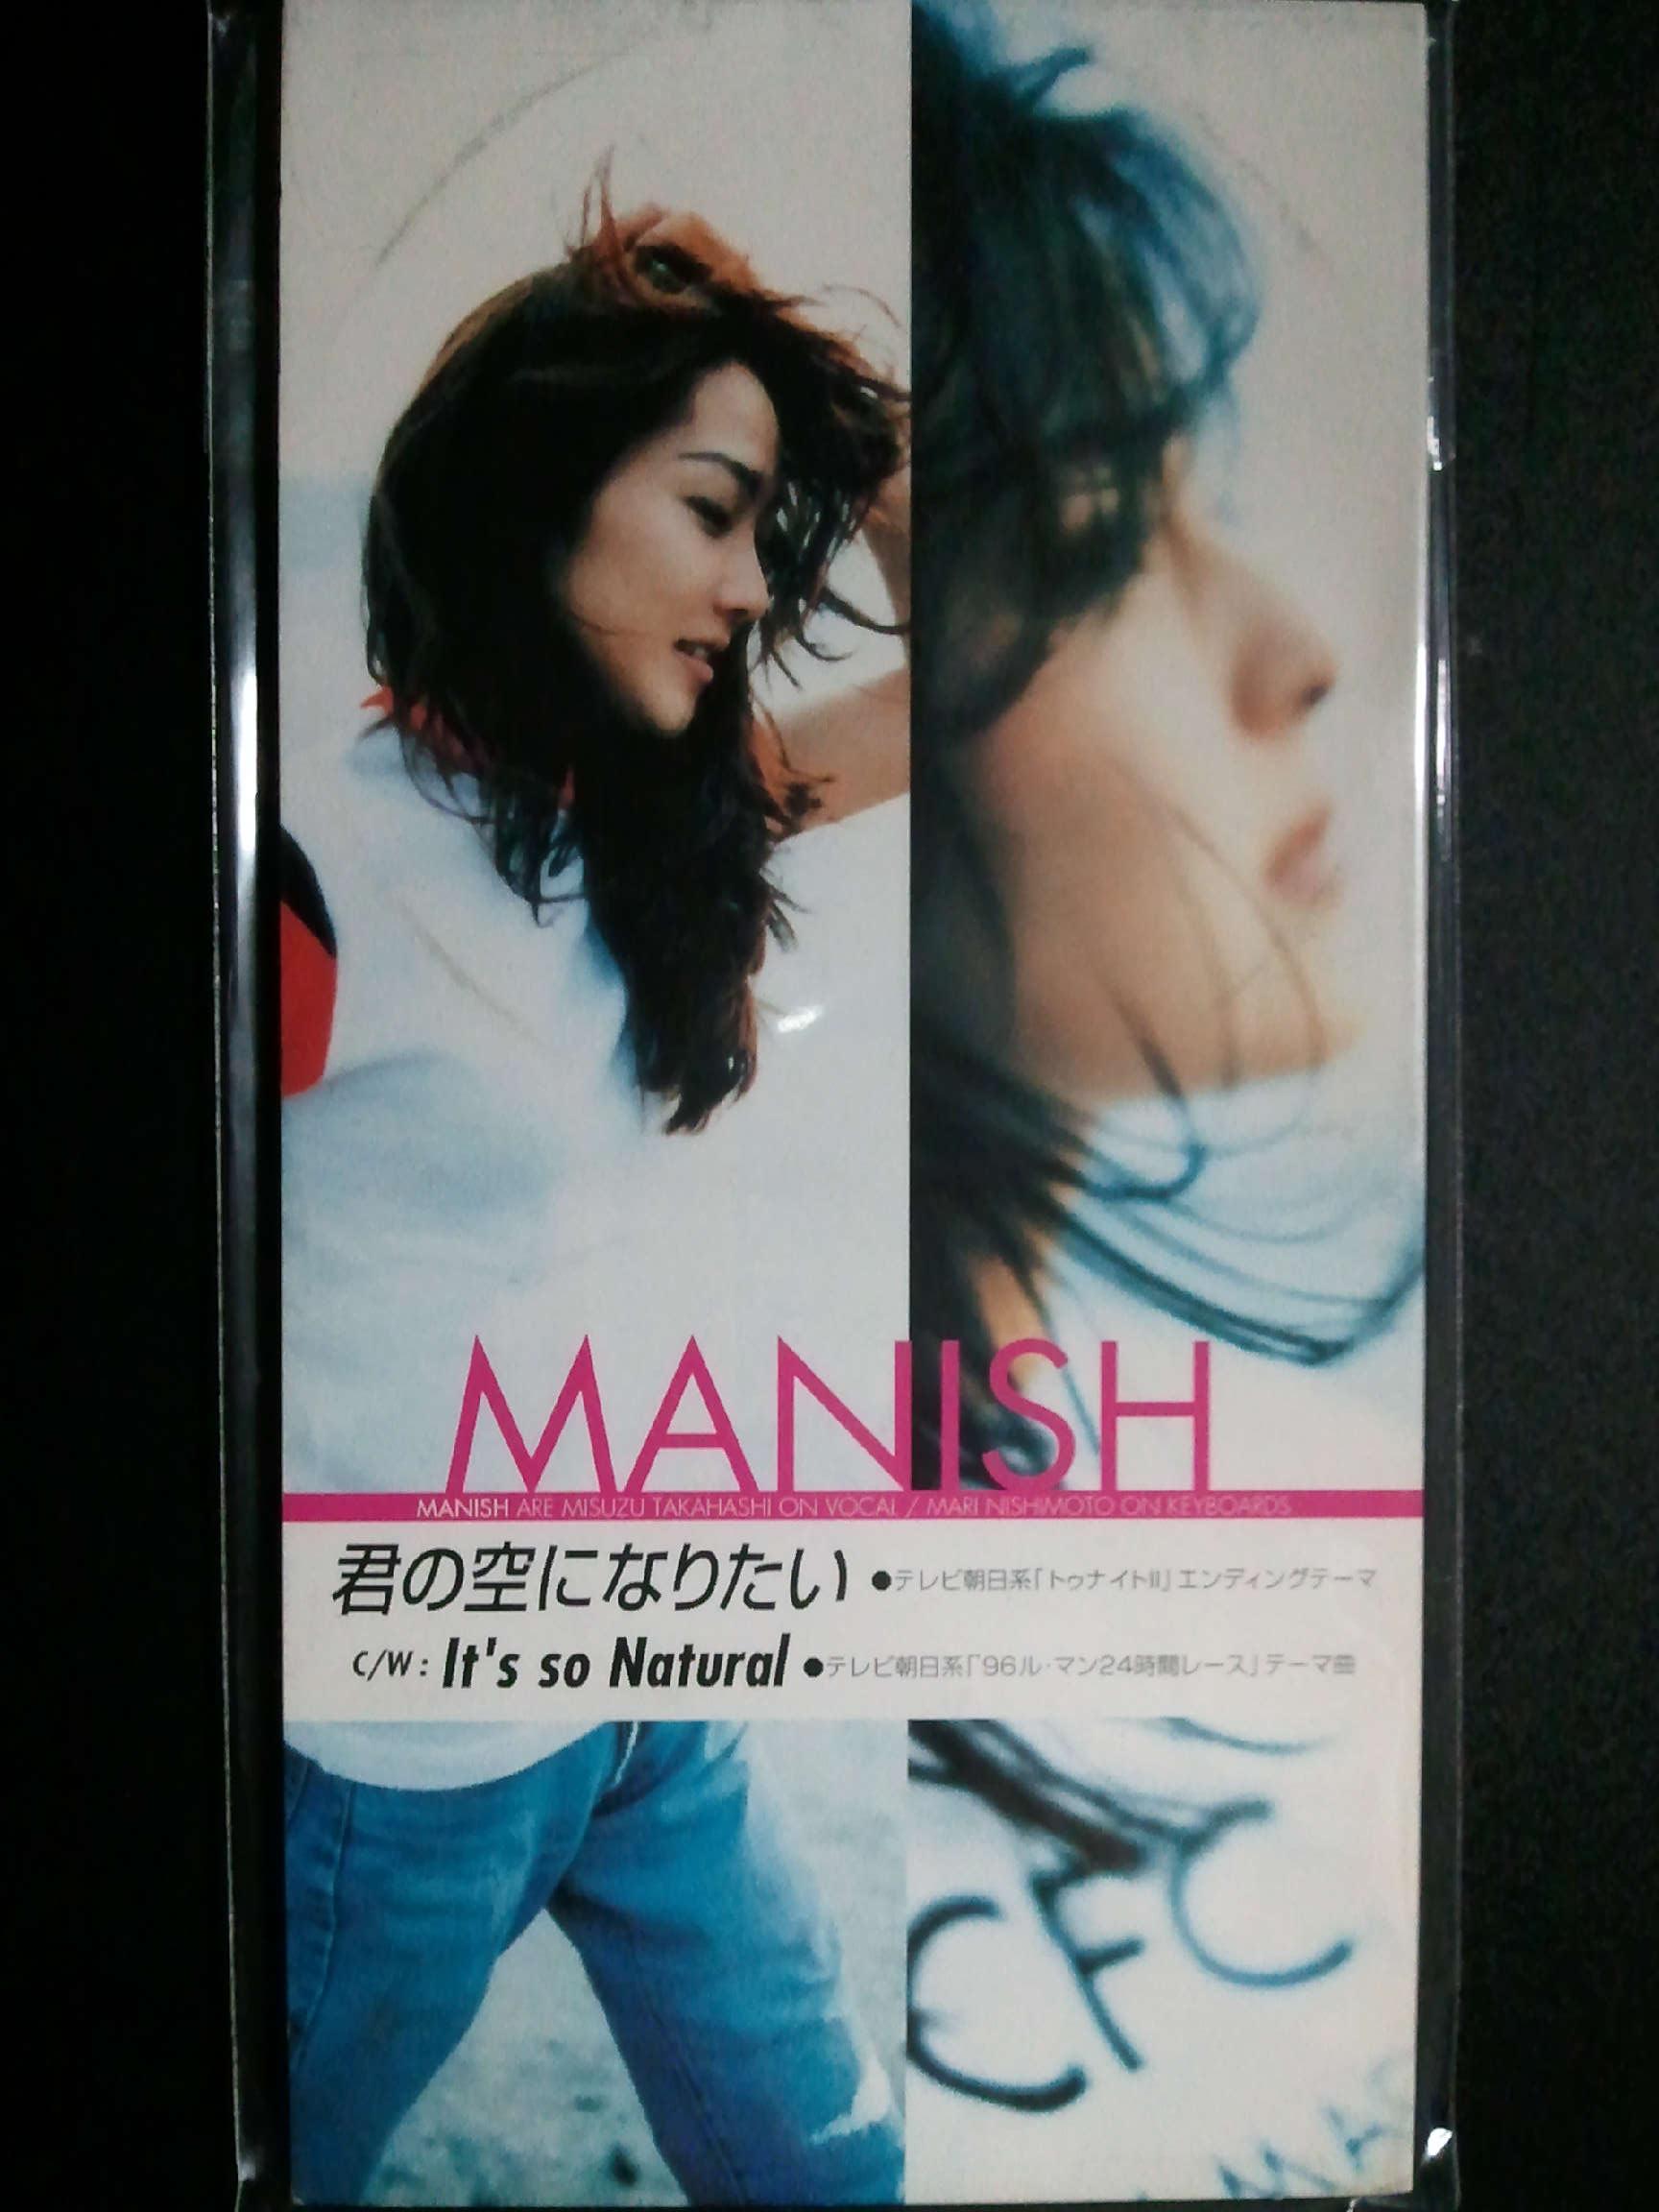 MANISH 君の空になりたい